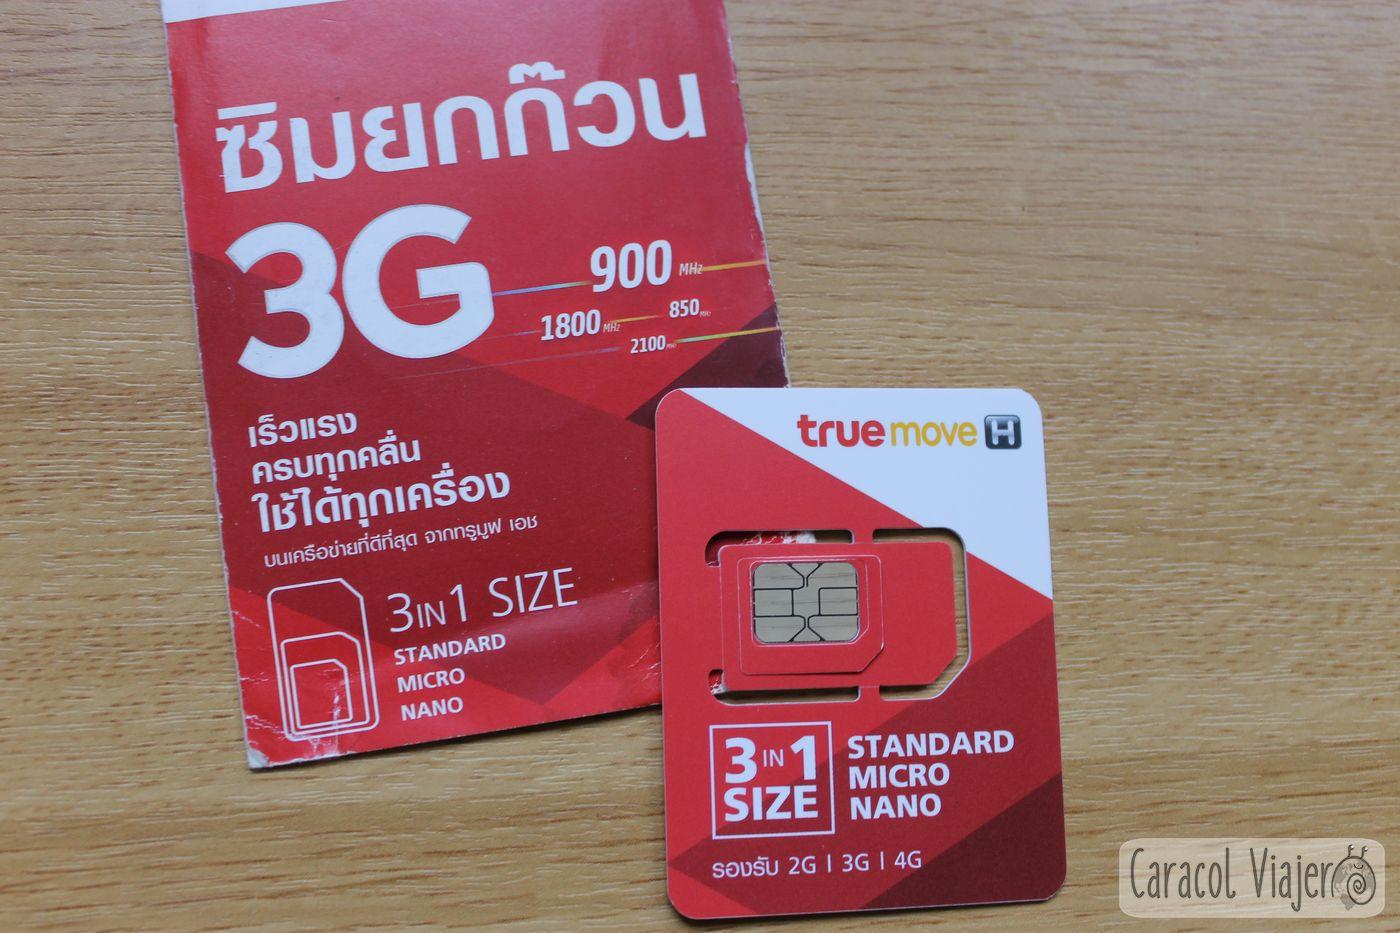 Tarjeta True Move Tailandia